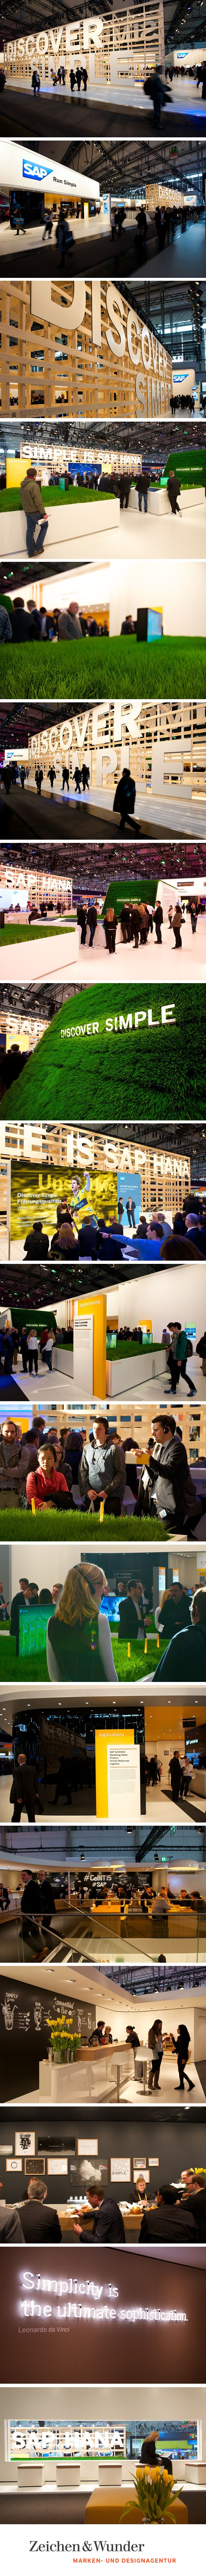 SAP AG Markenauftritt Auf Der CeBIT 2015 Discover Simple Simplicity Corporate DesignCorporate IdentityExhibition